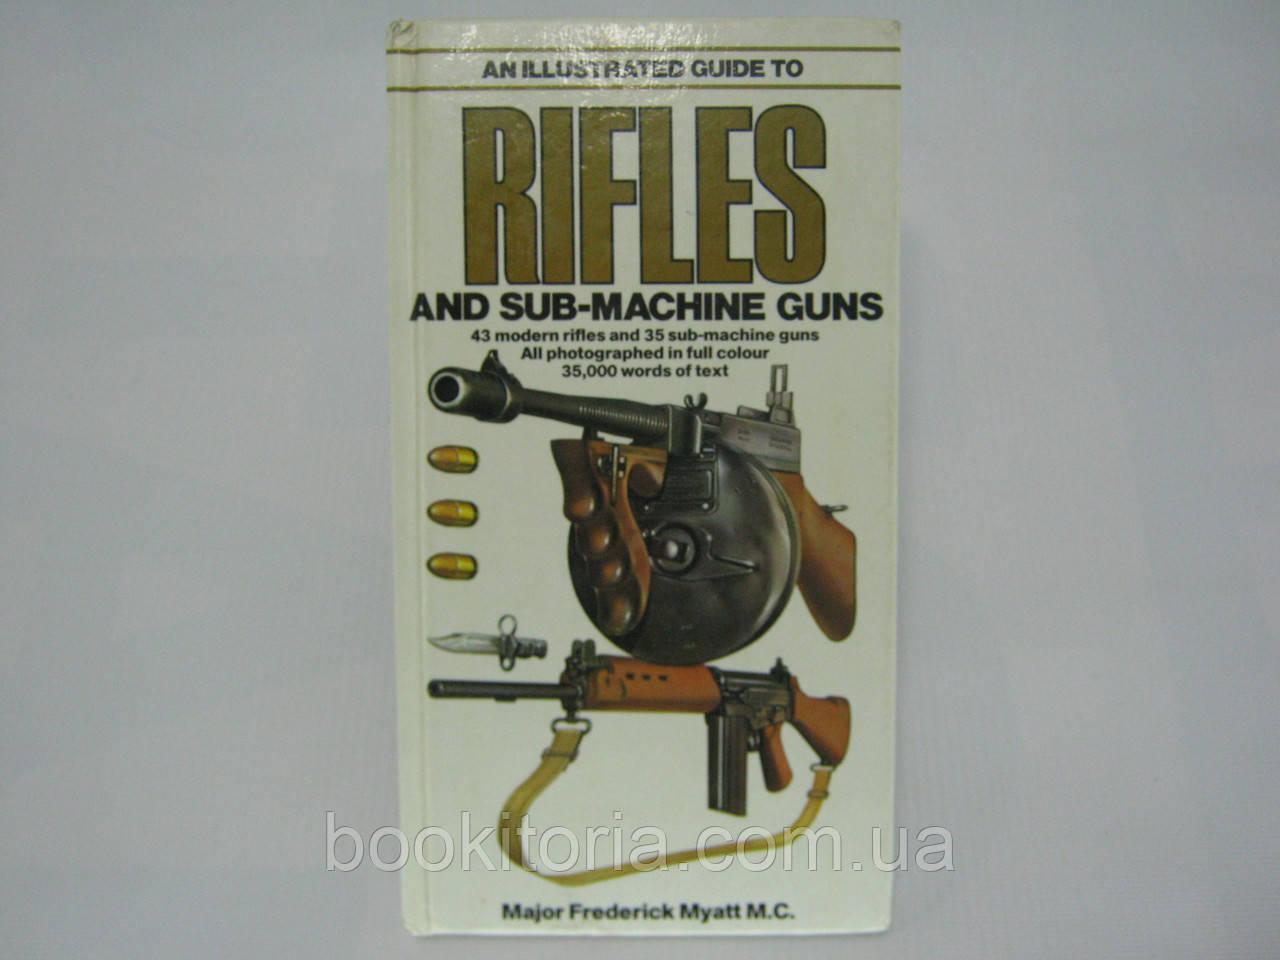 Myatt M.C. An illustrated guide to RIFLES AND SUB-MACHINE GUNS (б/у).